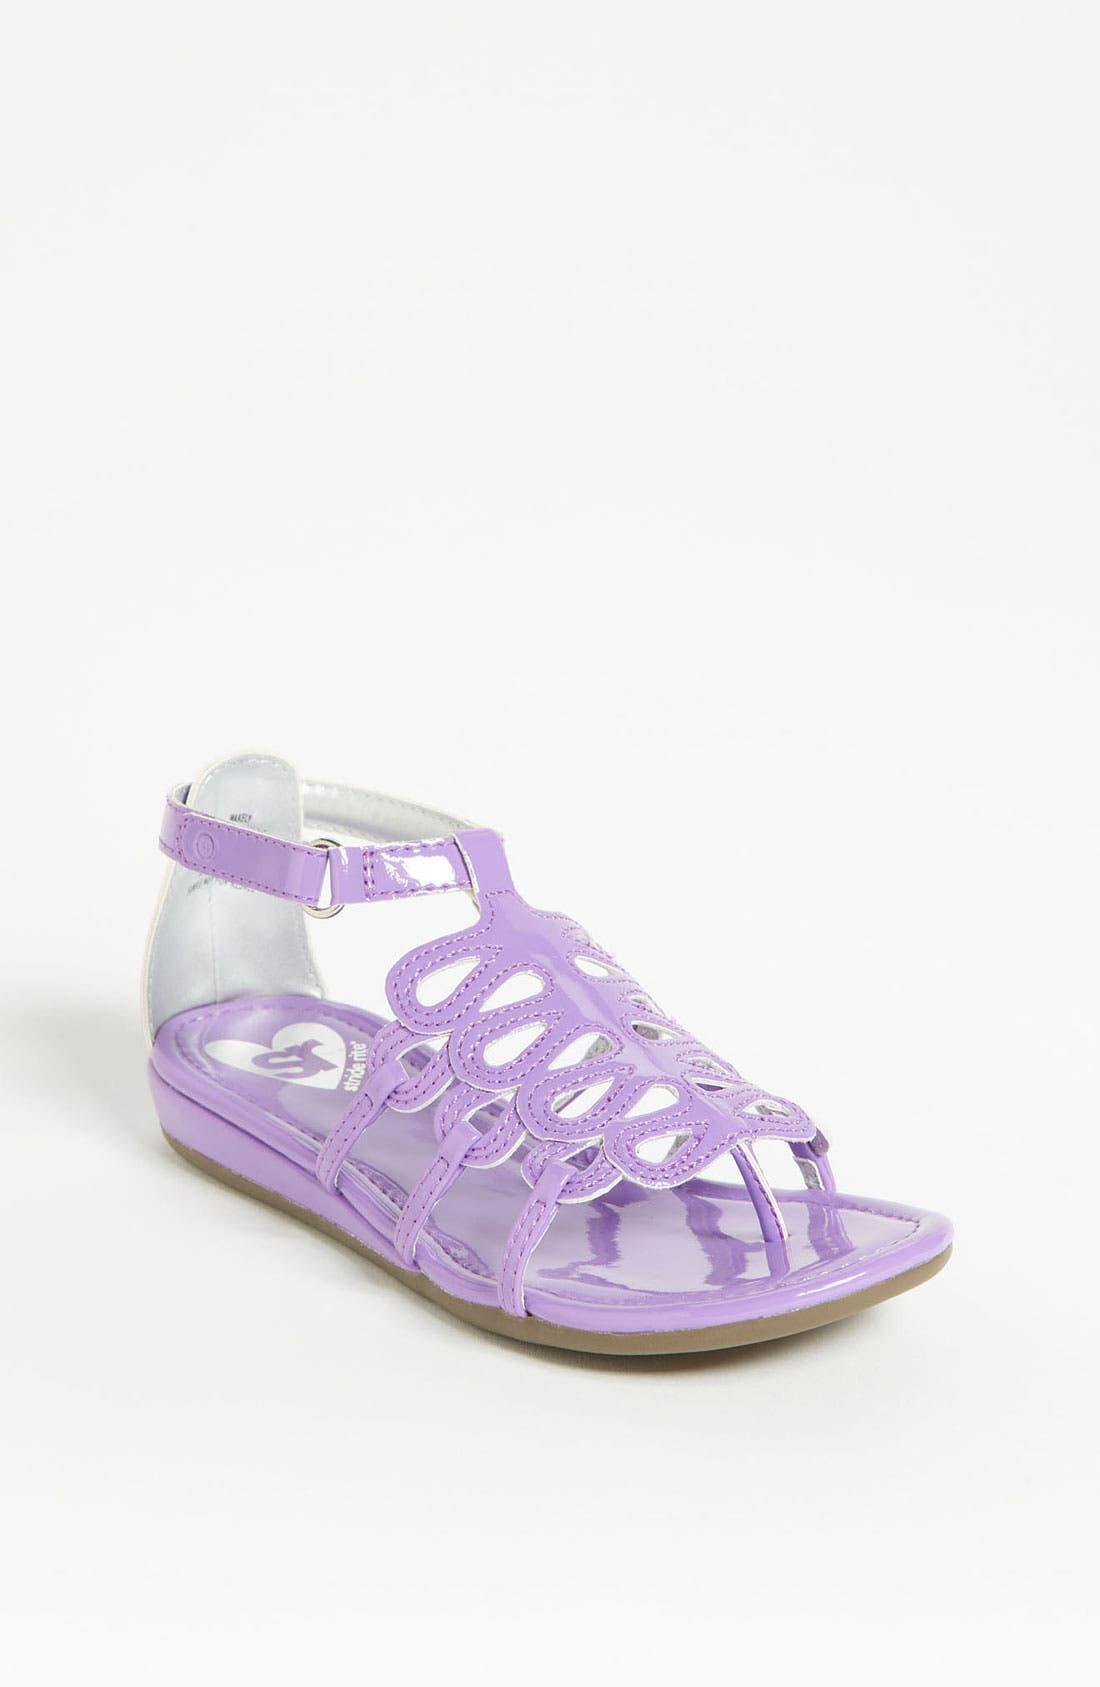 Alternate Image 1 Selected - Stride Rite 'Wakely' Sandal (Toddler)